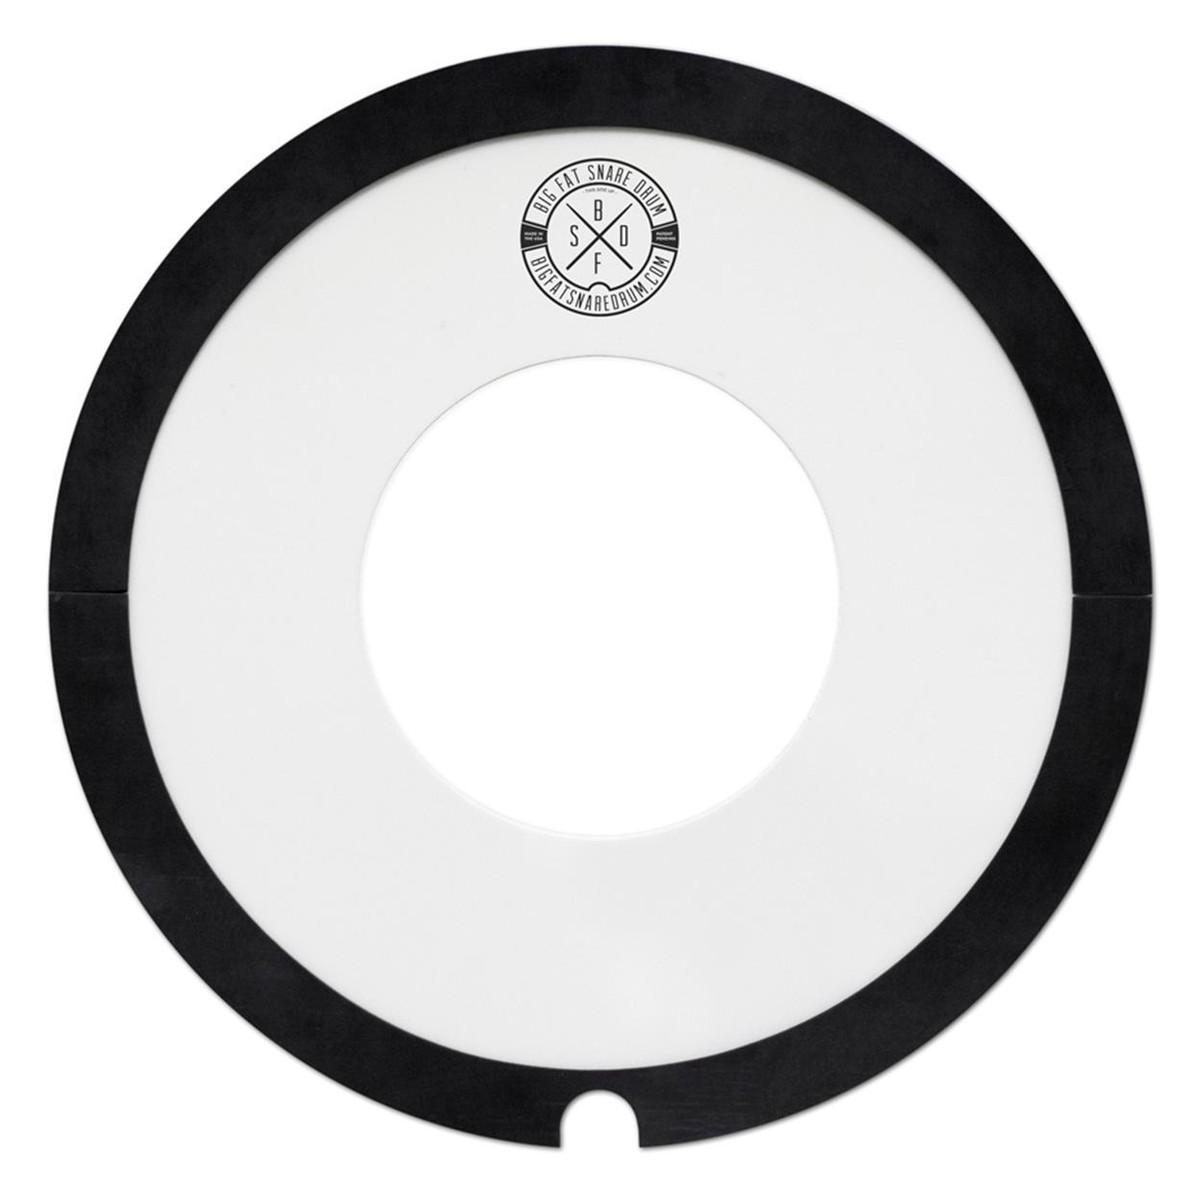 Big Fat Snare Drum